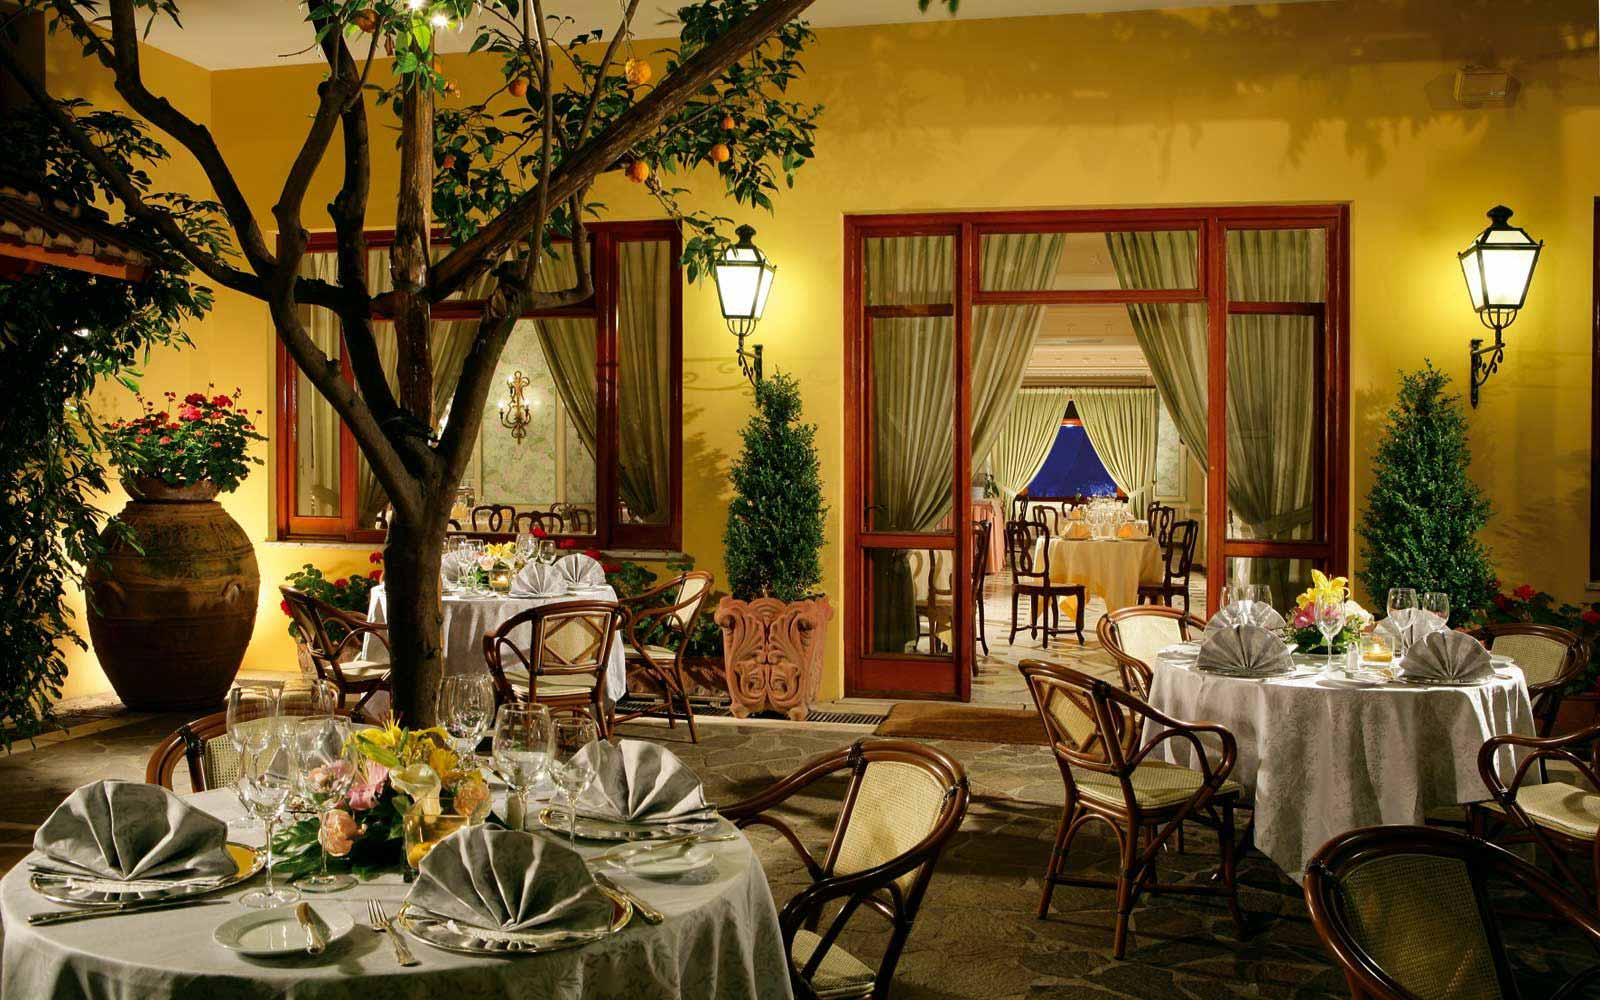 Outdoor dinning at Grand Hotel de la Ville